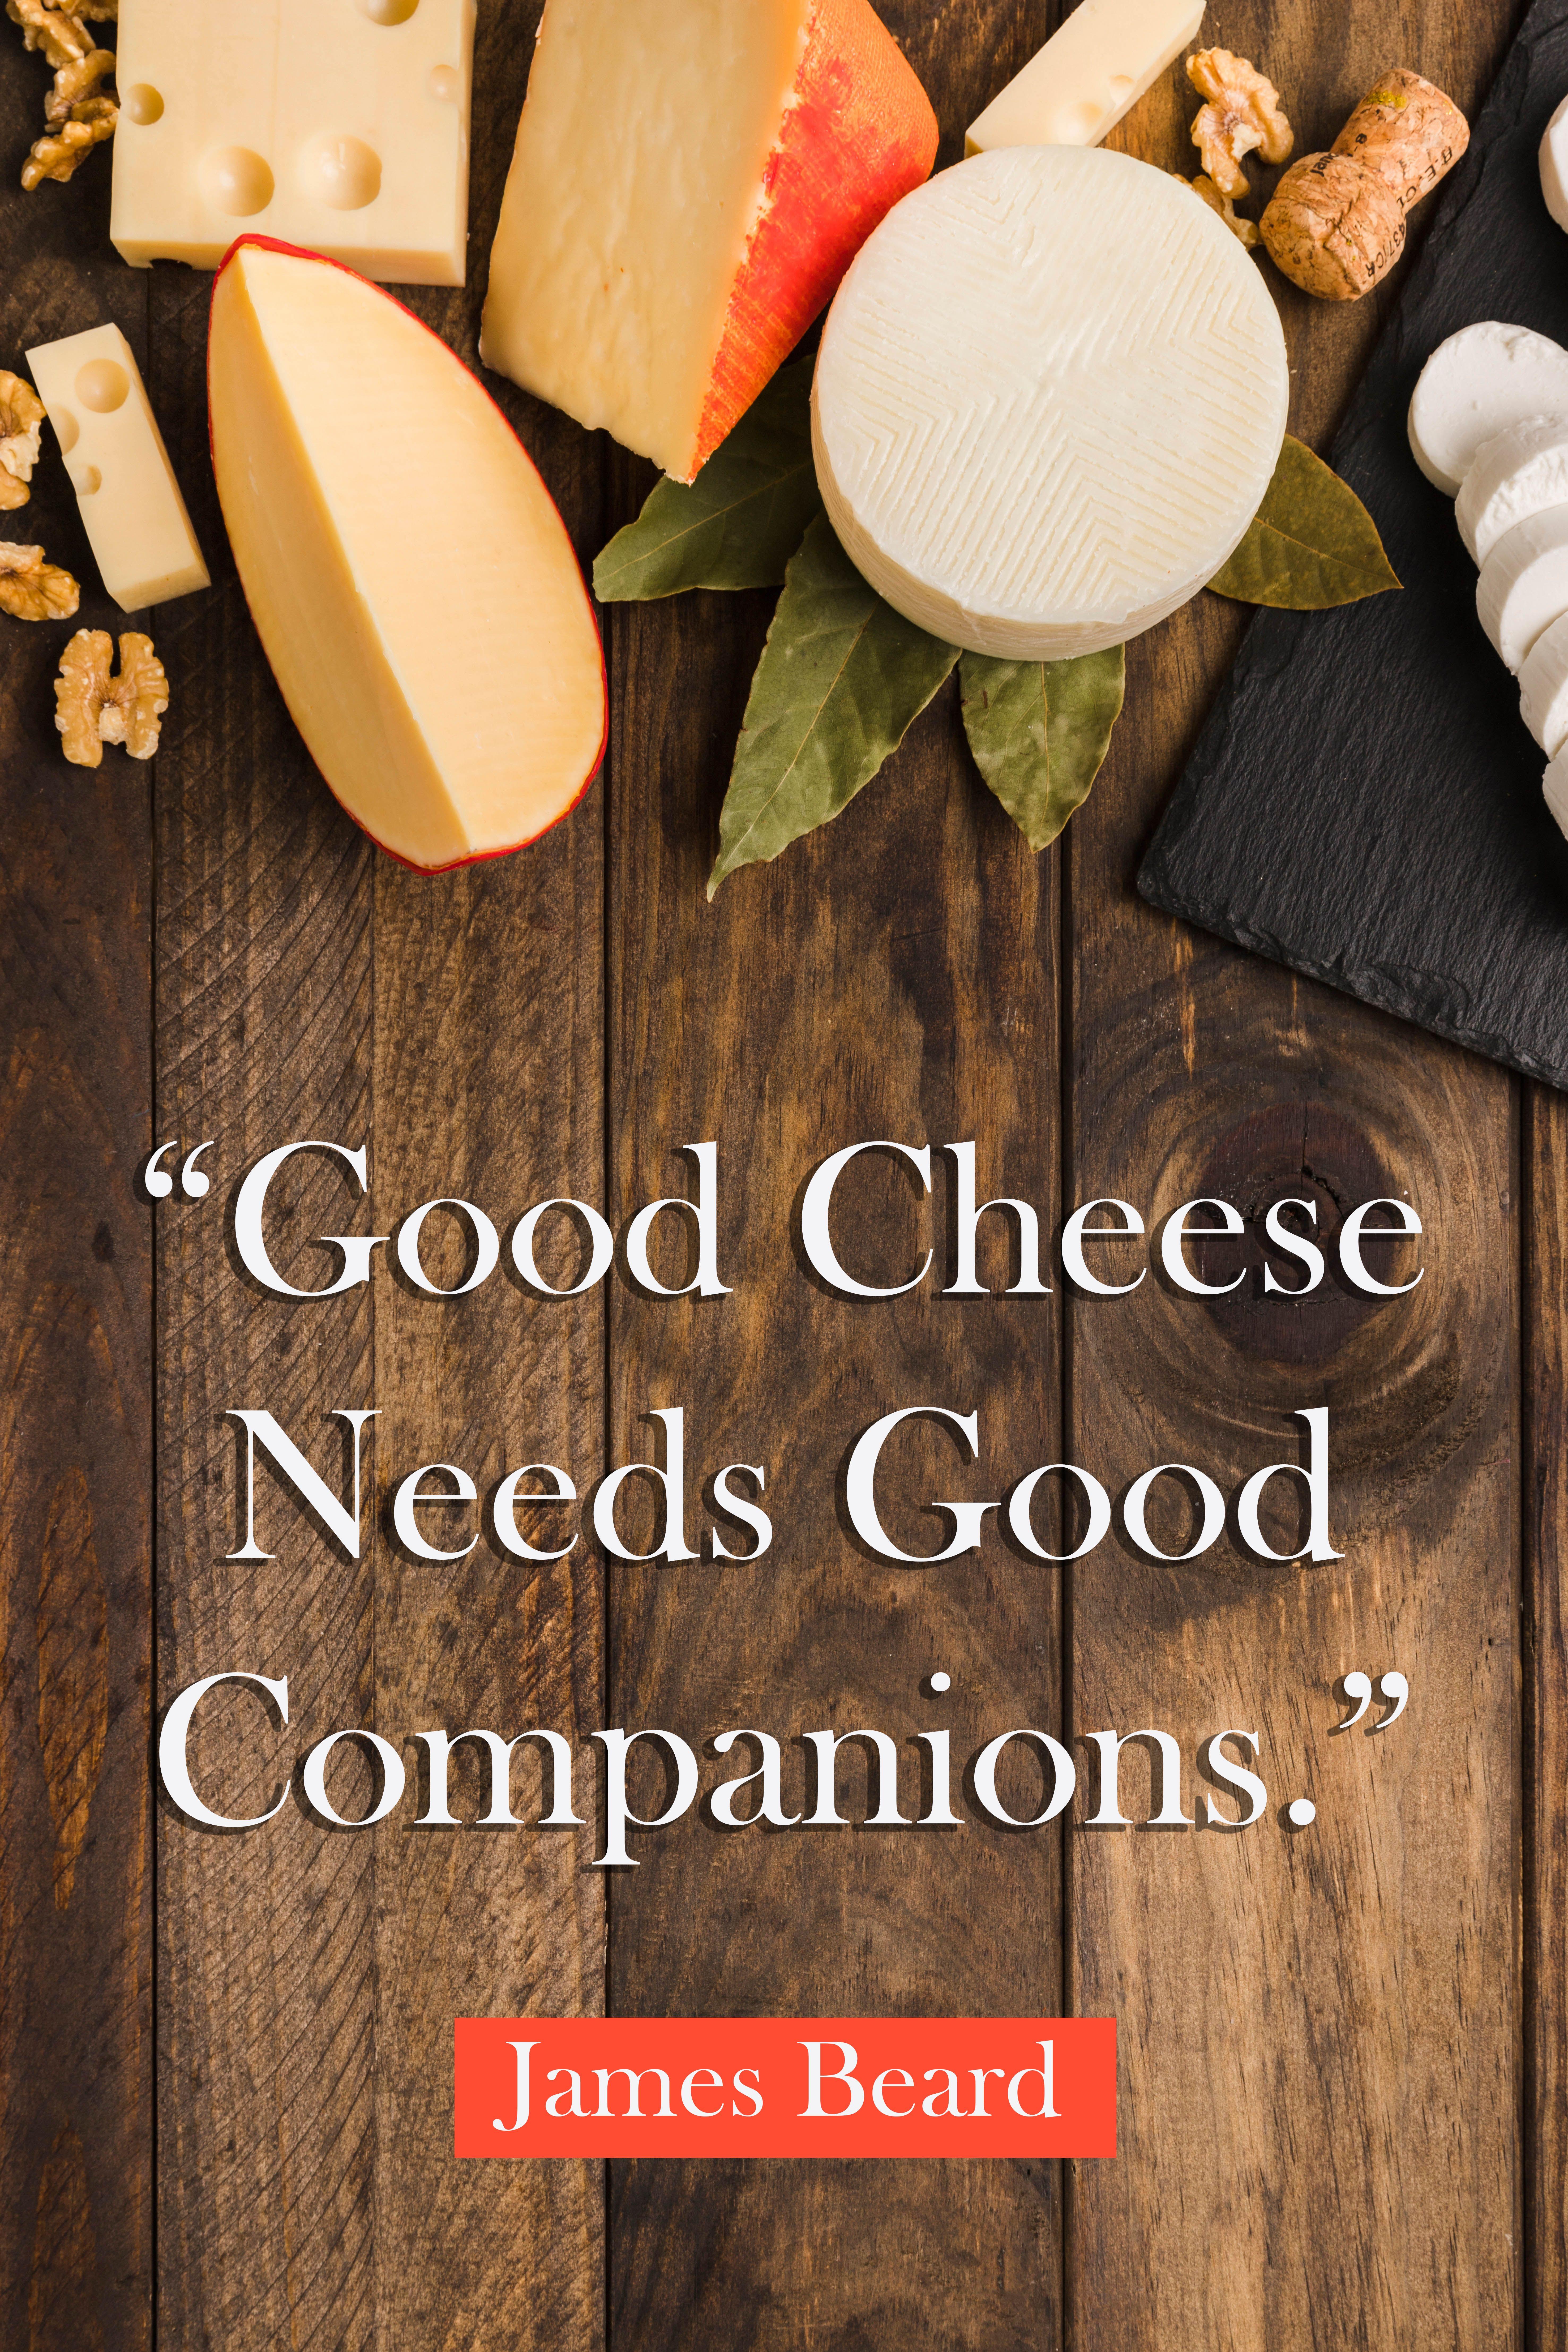 Pin by Nadezhda Dimitrova on Food quotes